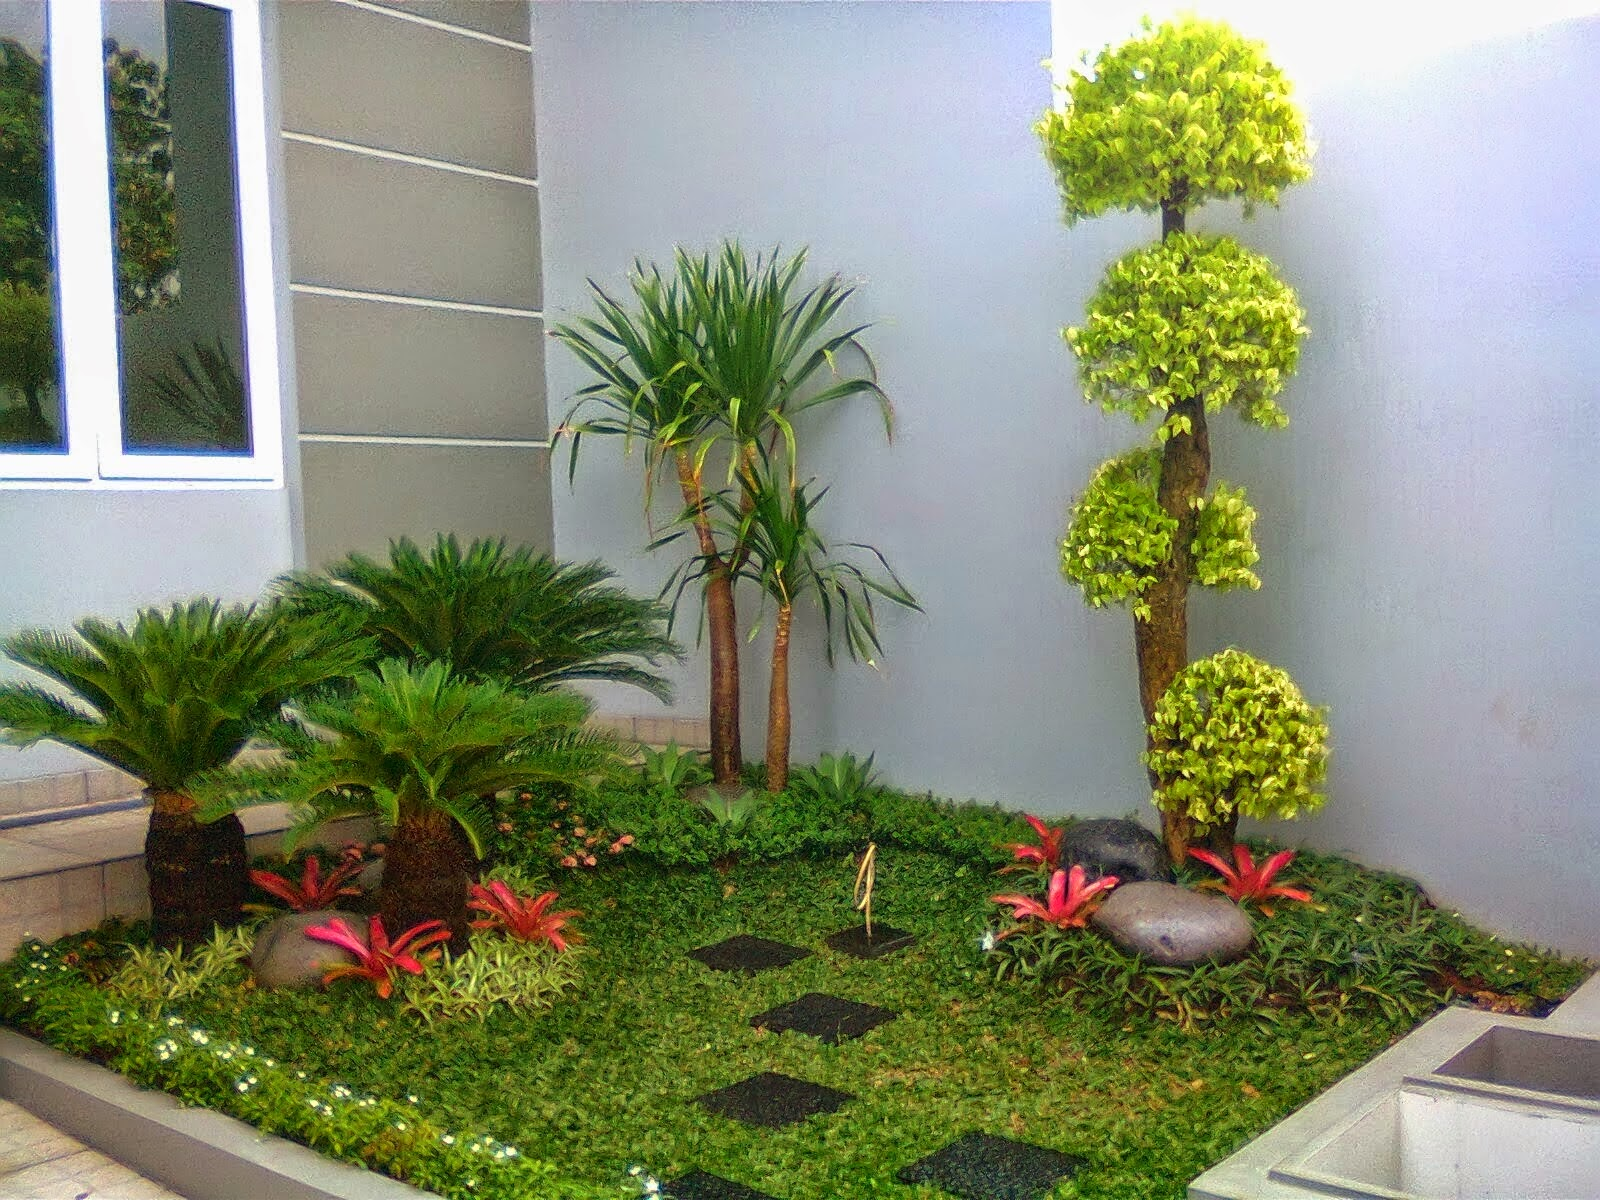 Tukang taman minimalis | suplier tanaman dan rumput